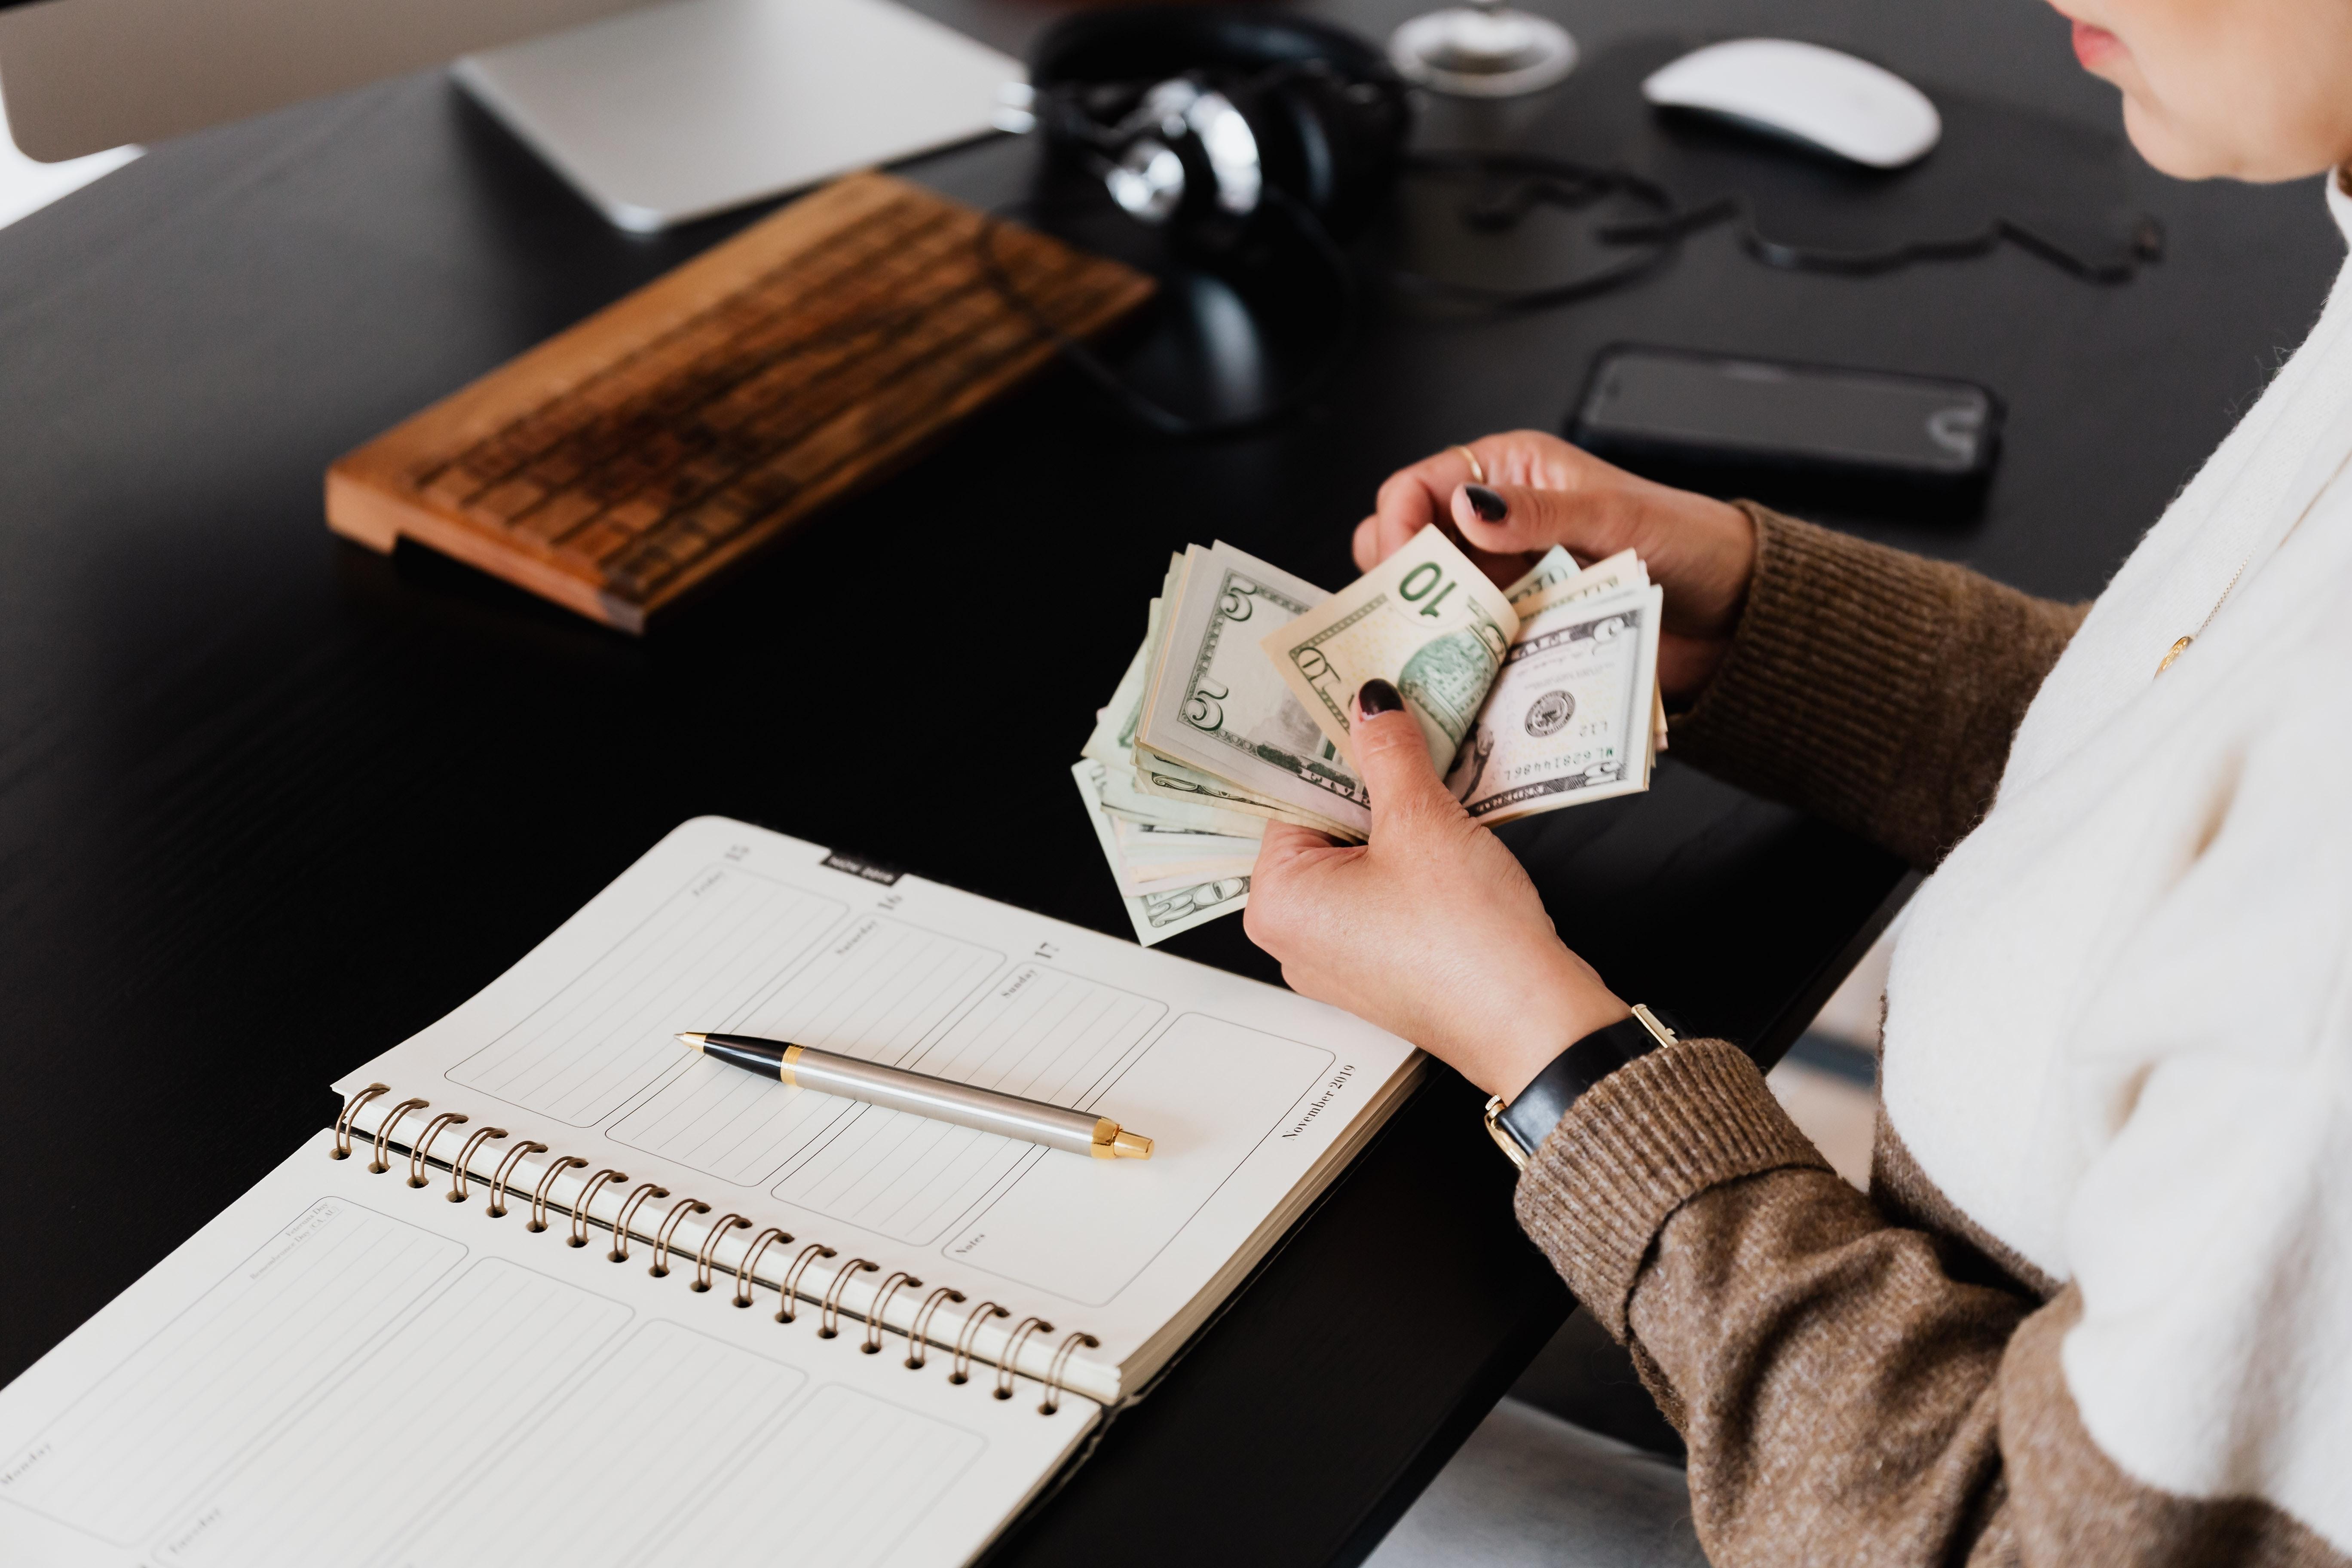 ucaas remote work solutions money desk computer